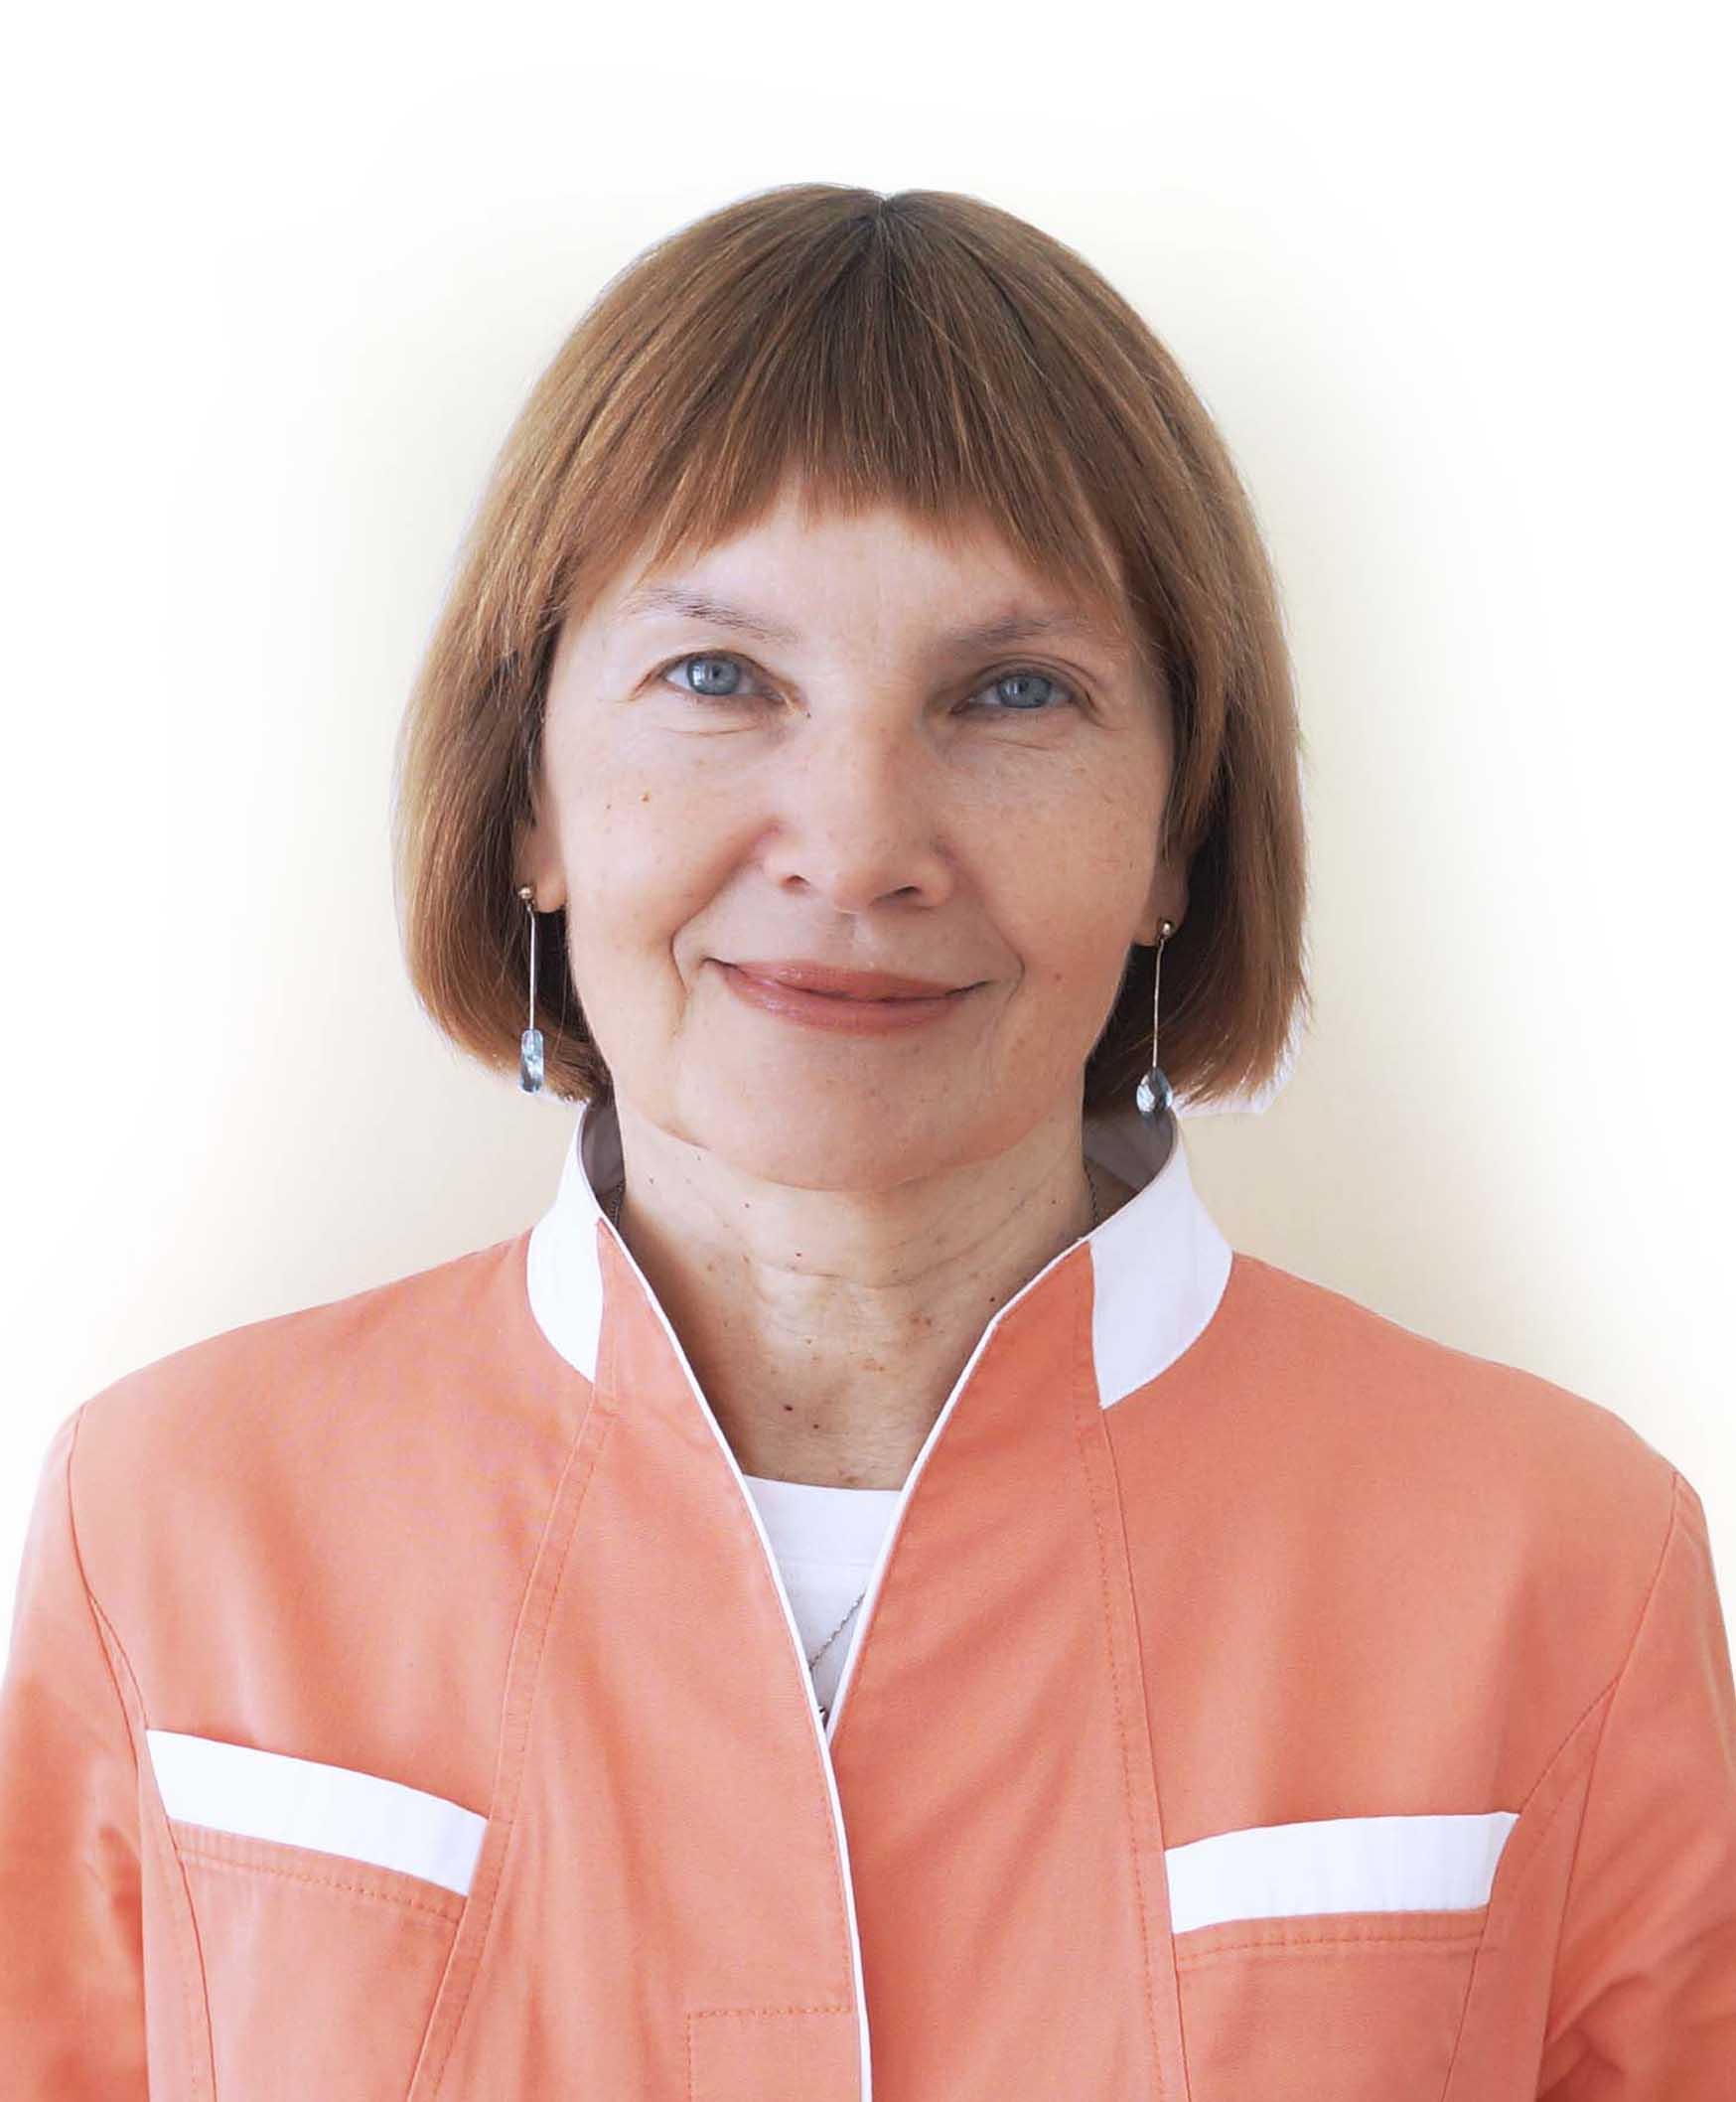 Иванова Светлана Юрьевна остеопат